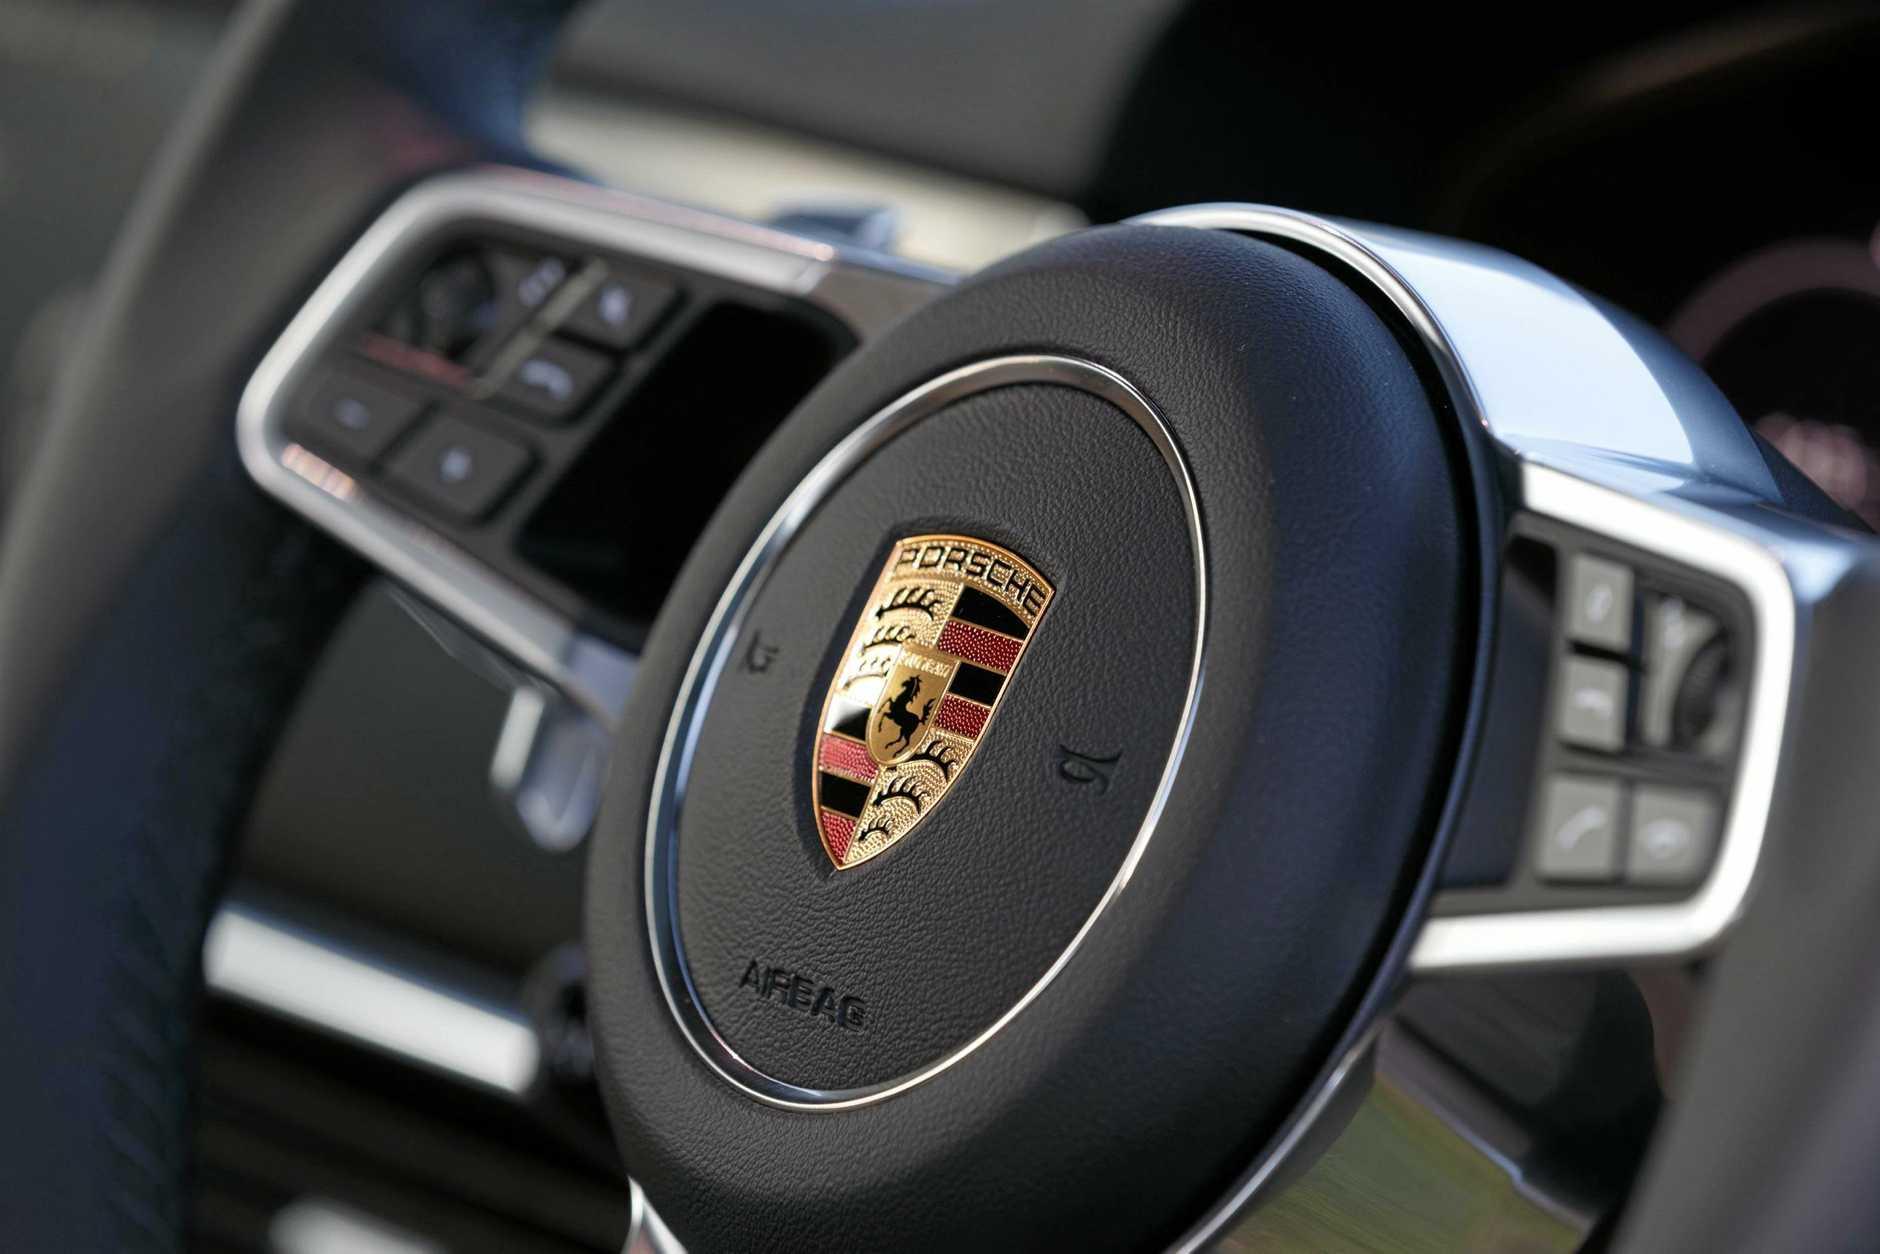 Inside the Porsche Cayenne.